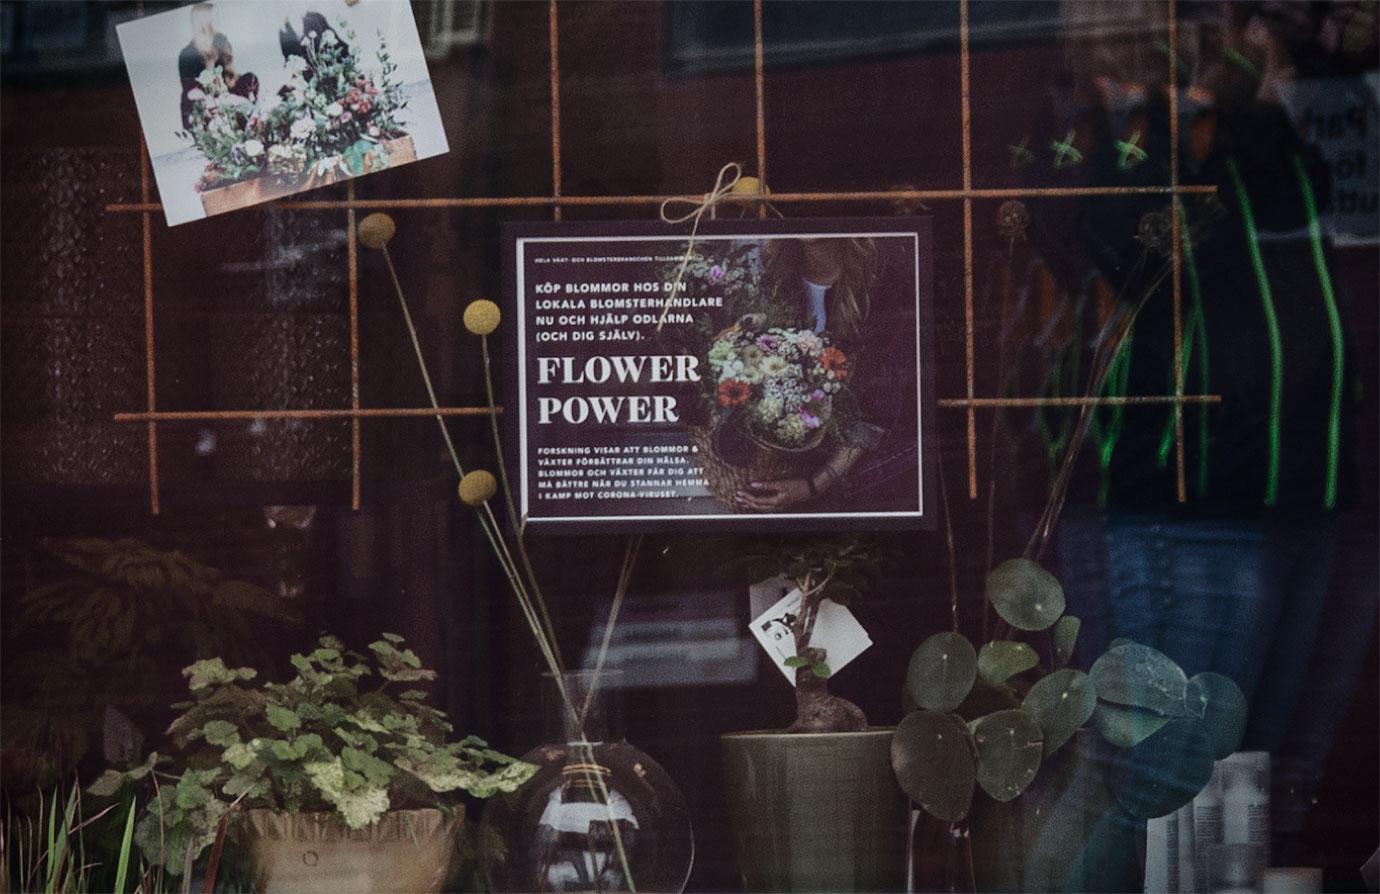 81: Flower power (90/183)